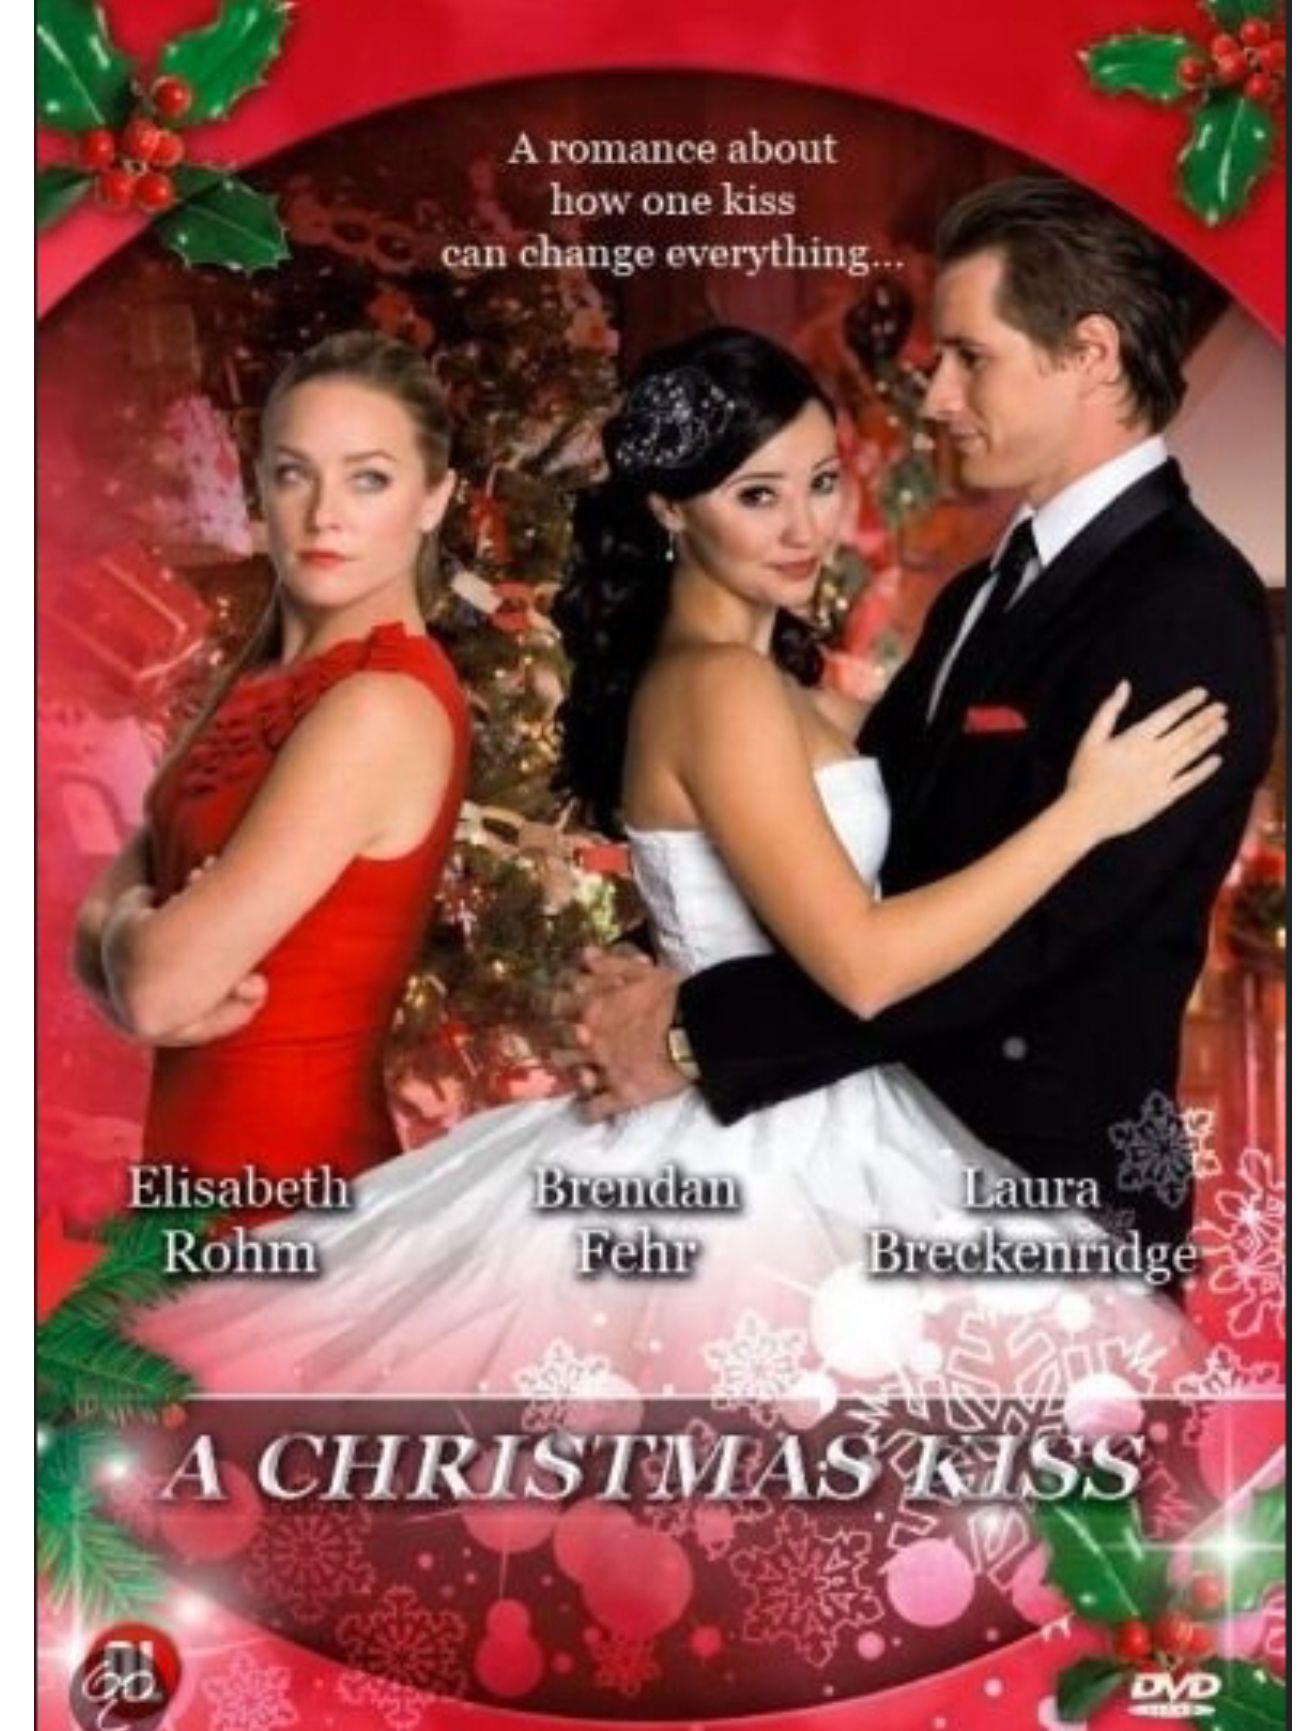 Wanna See This Romantic Christmas Movies Christmas Movies